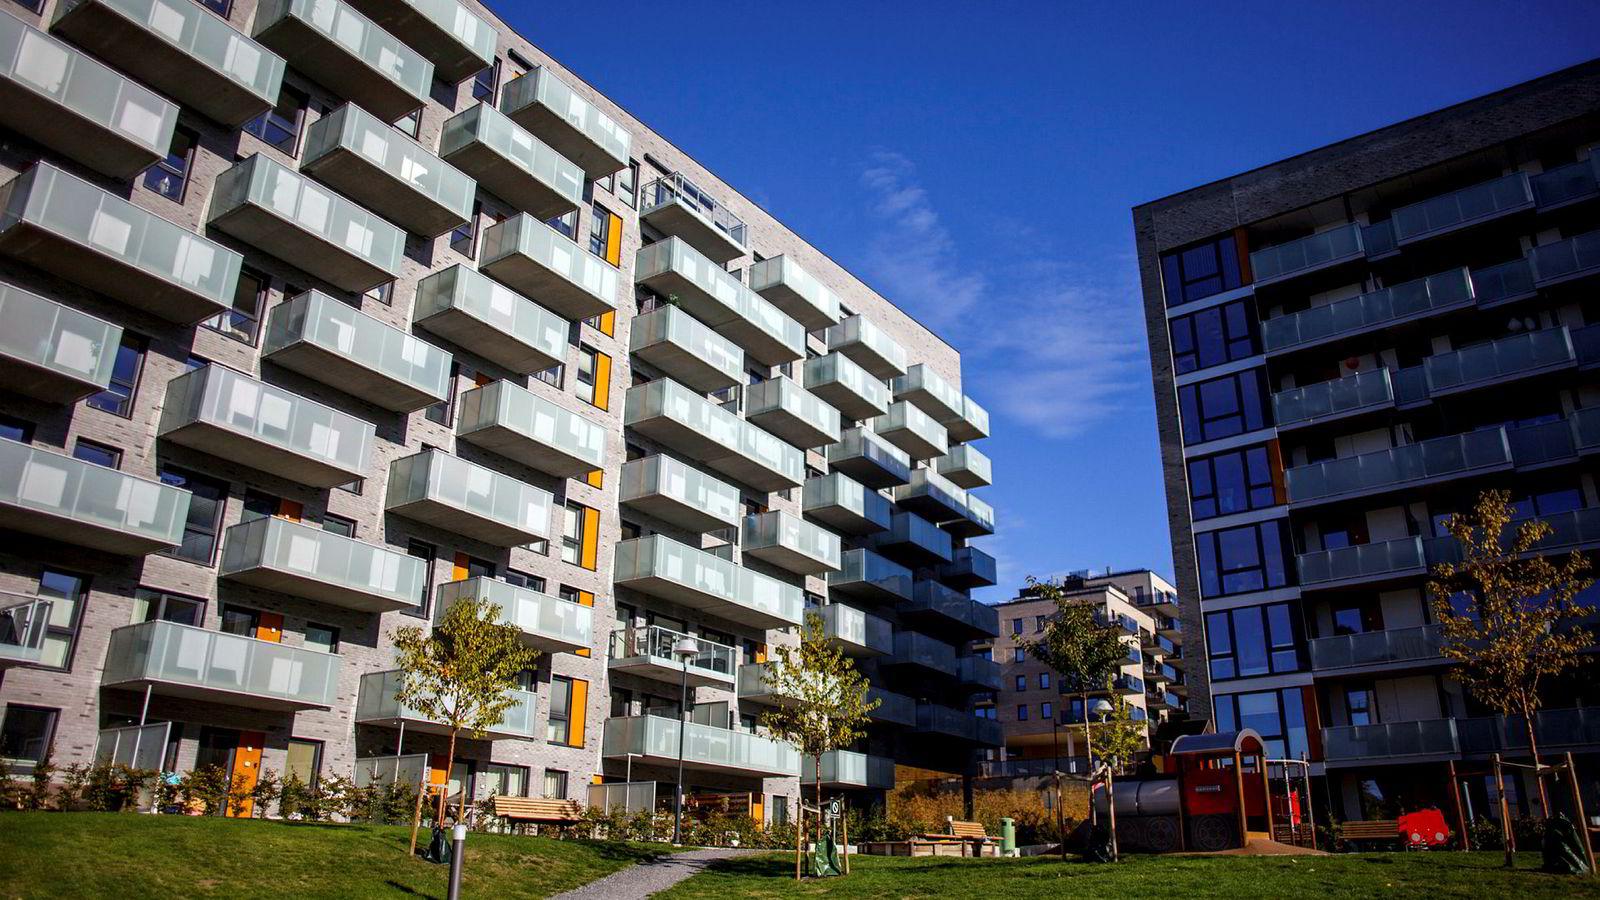 Forbrukerrådets beregninger viser at bankene tjener altfor mye på boliglån.